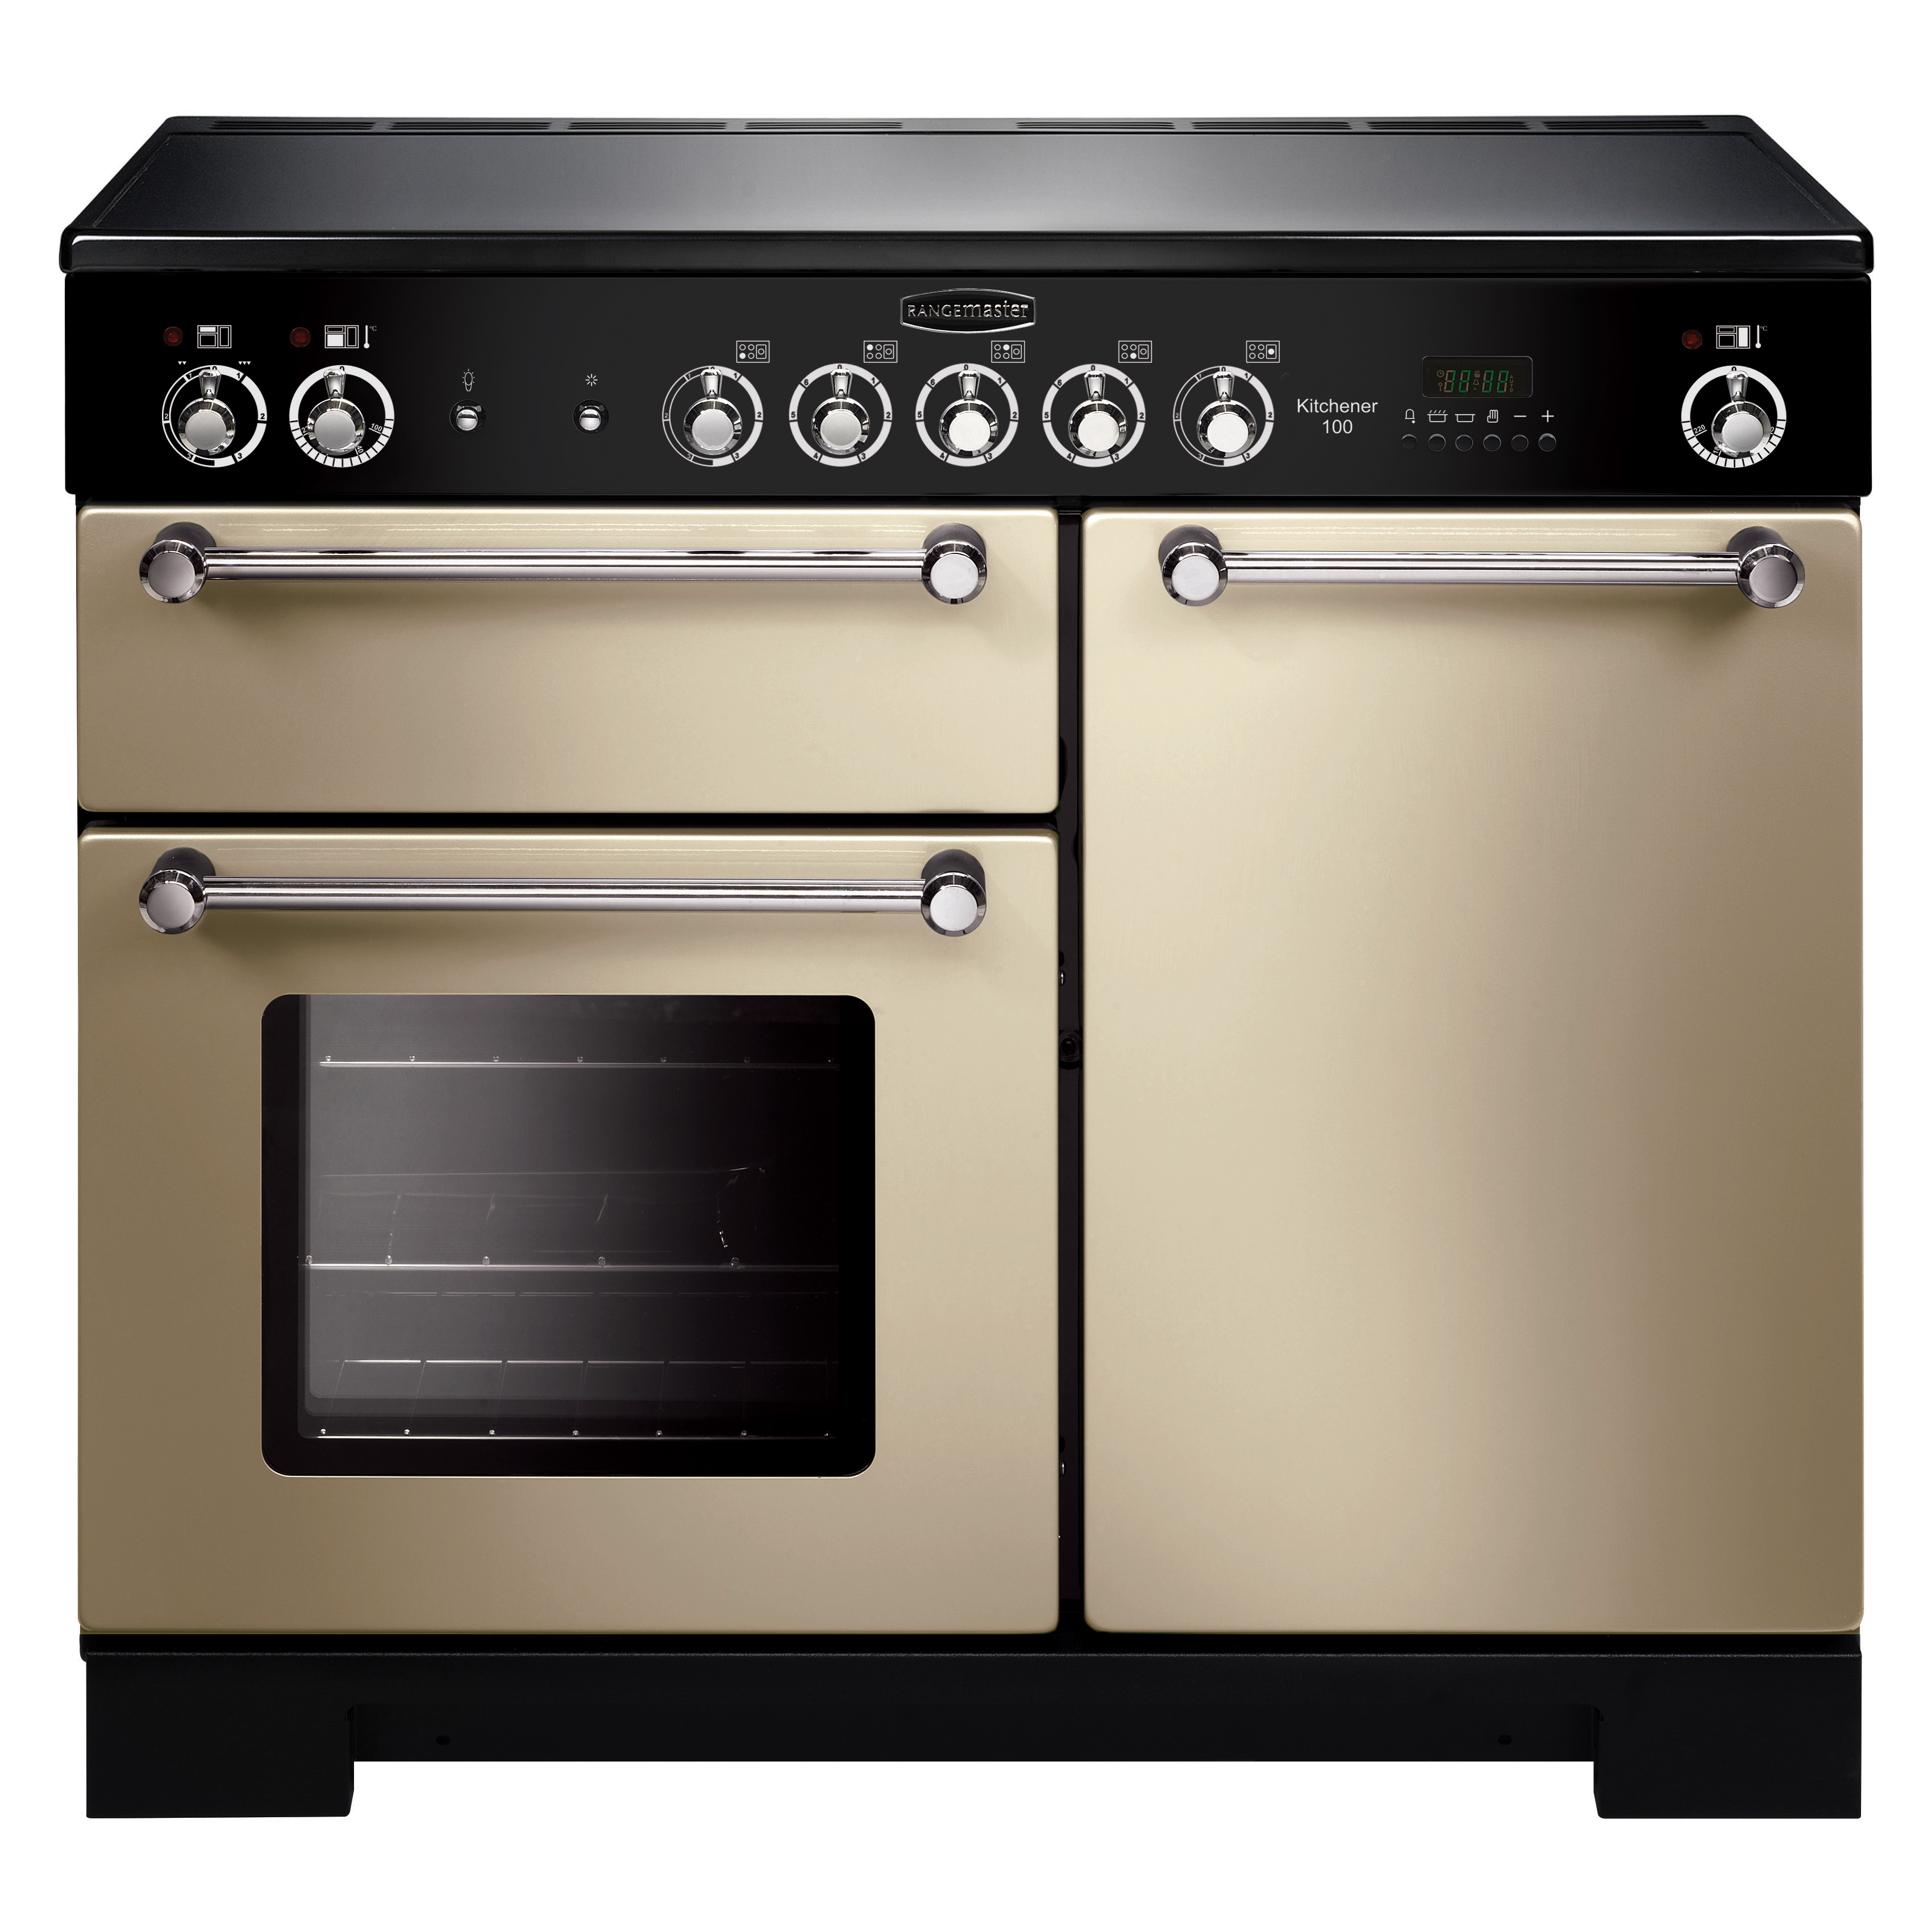 Uncategorized Appliance Kitchener buy rangemaster kch100eccr kitchener 100 ceramic range cooker cream